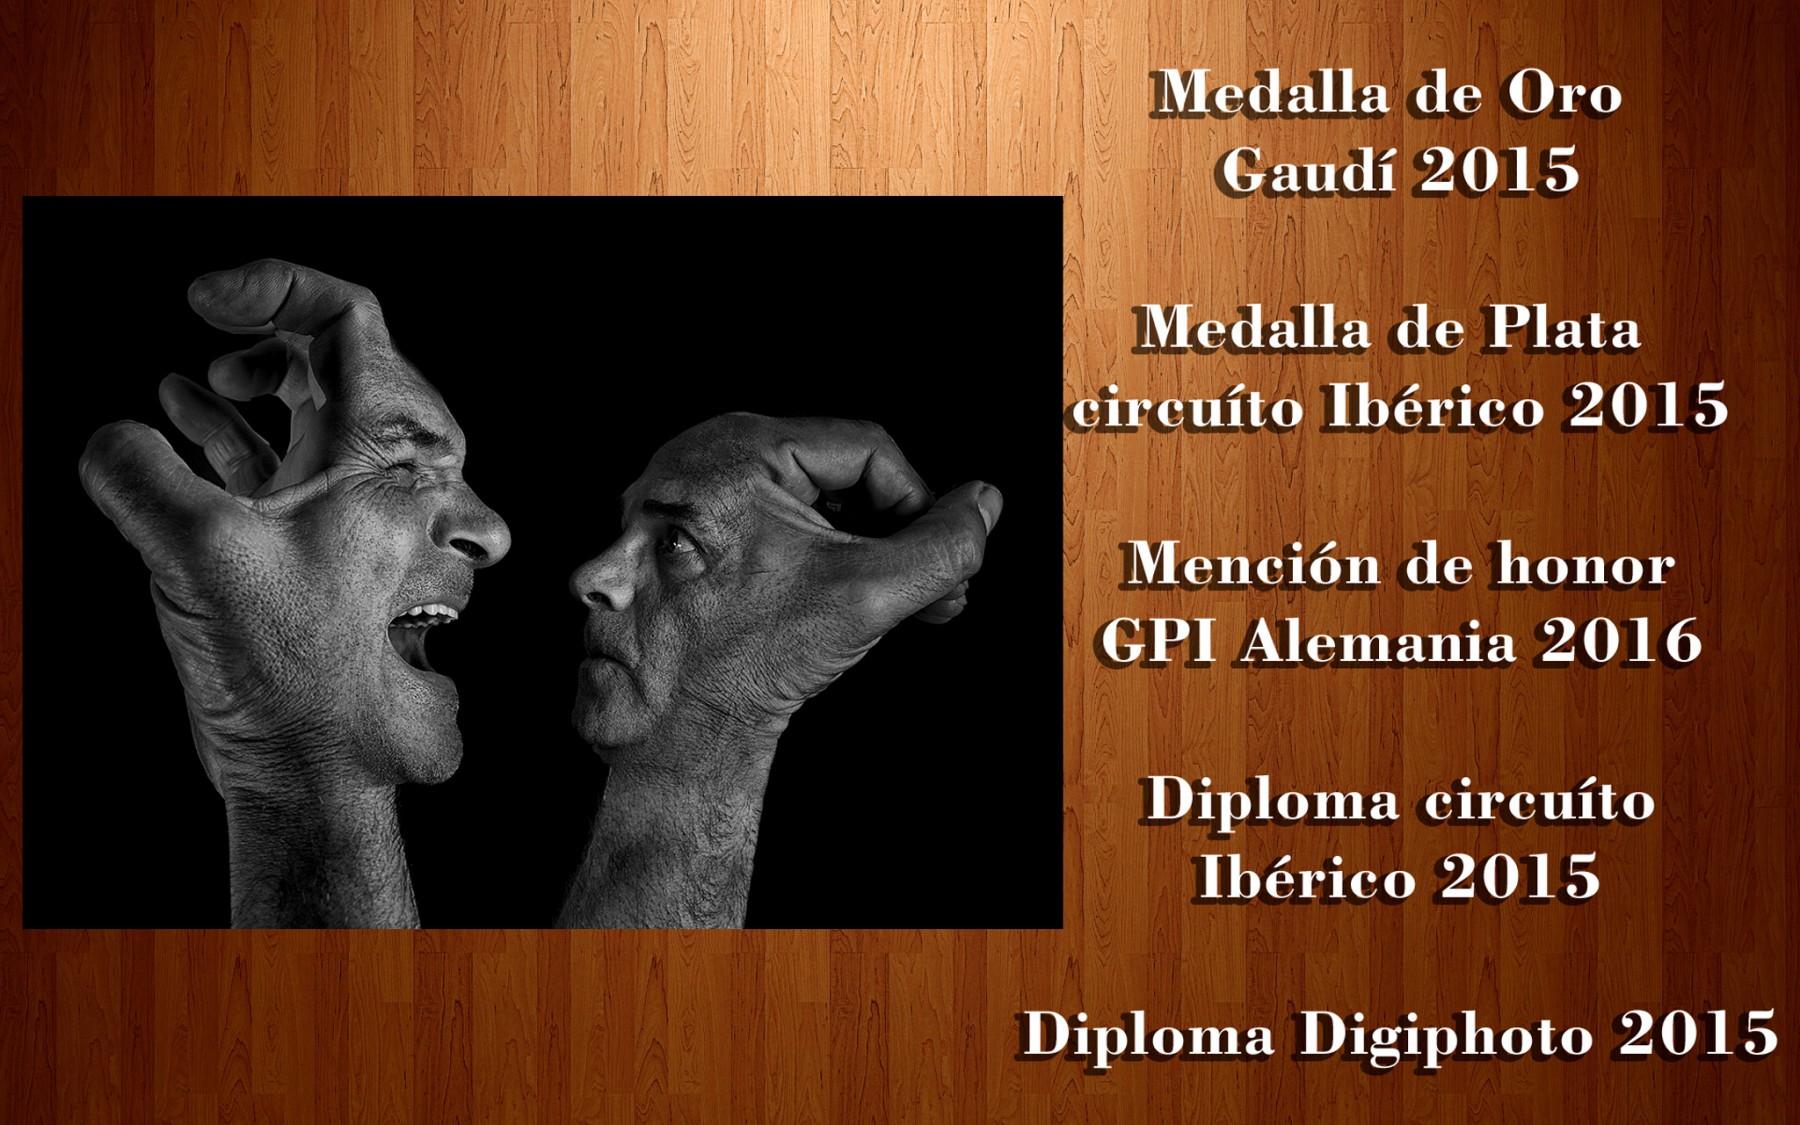 3-lightangel-fotografia-premios-fotograficospedro-jose-justicia